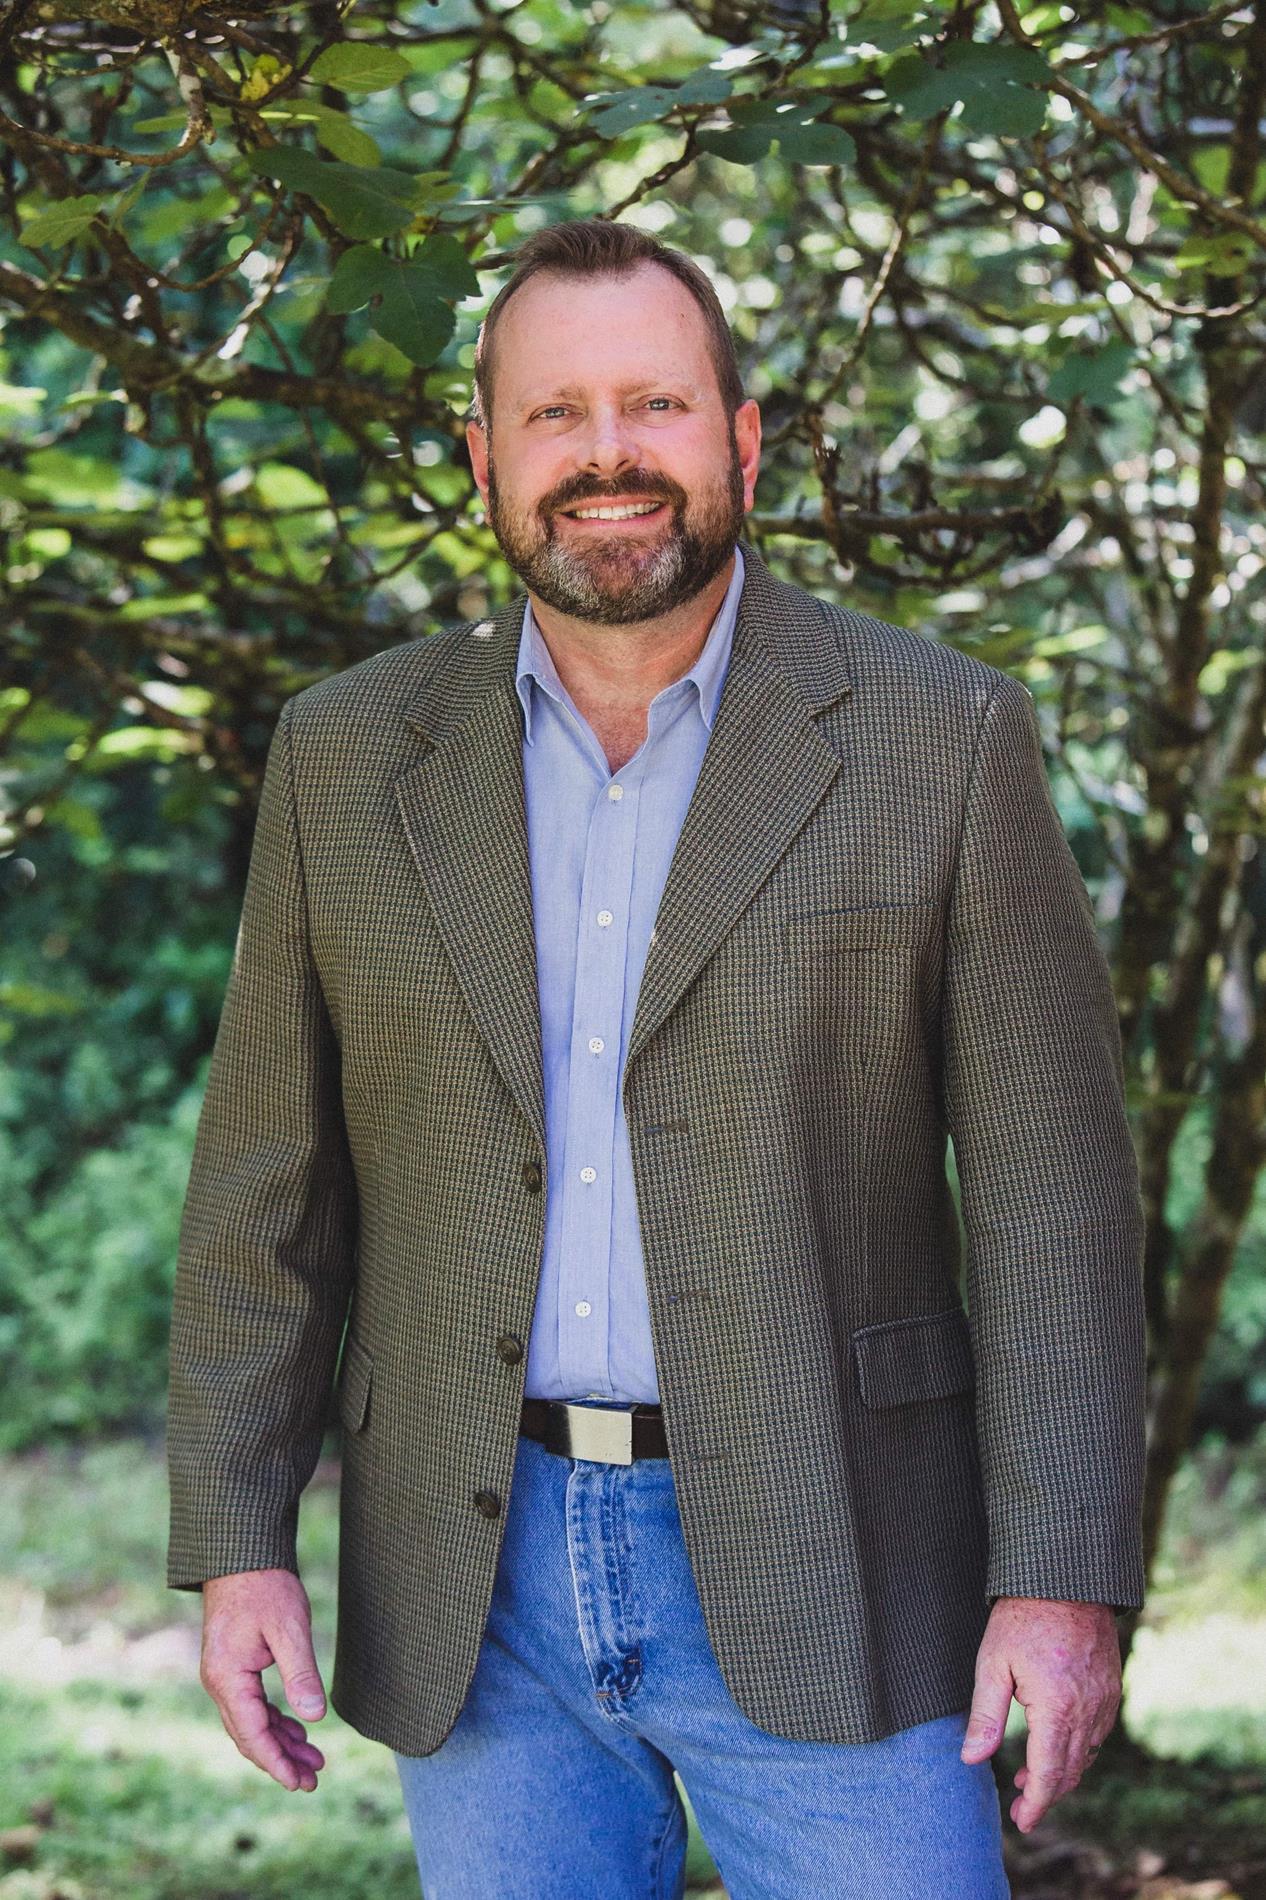 Kyle Peddie, Superintendent of Schools